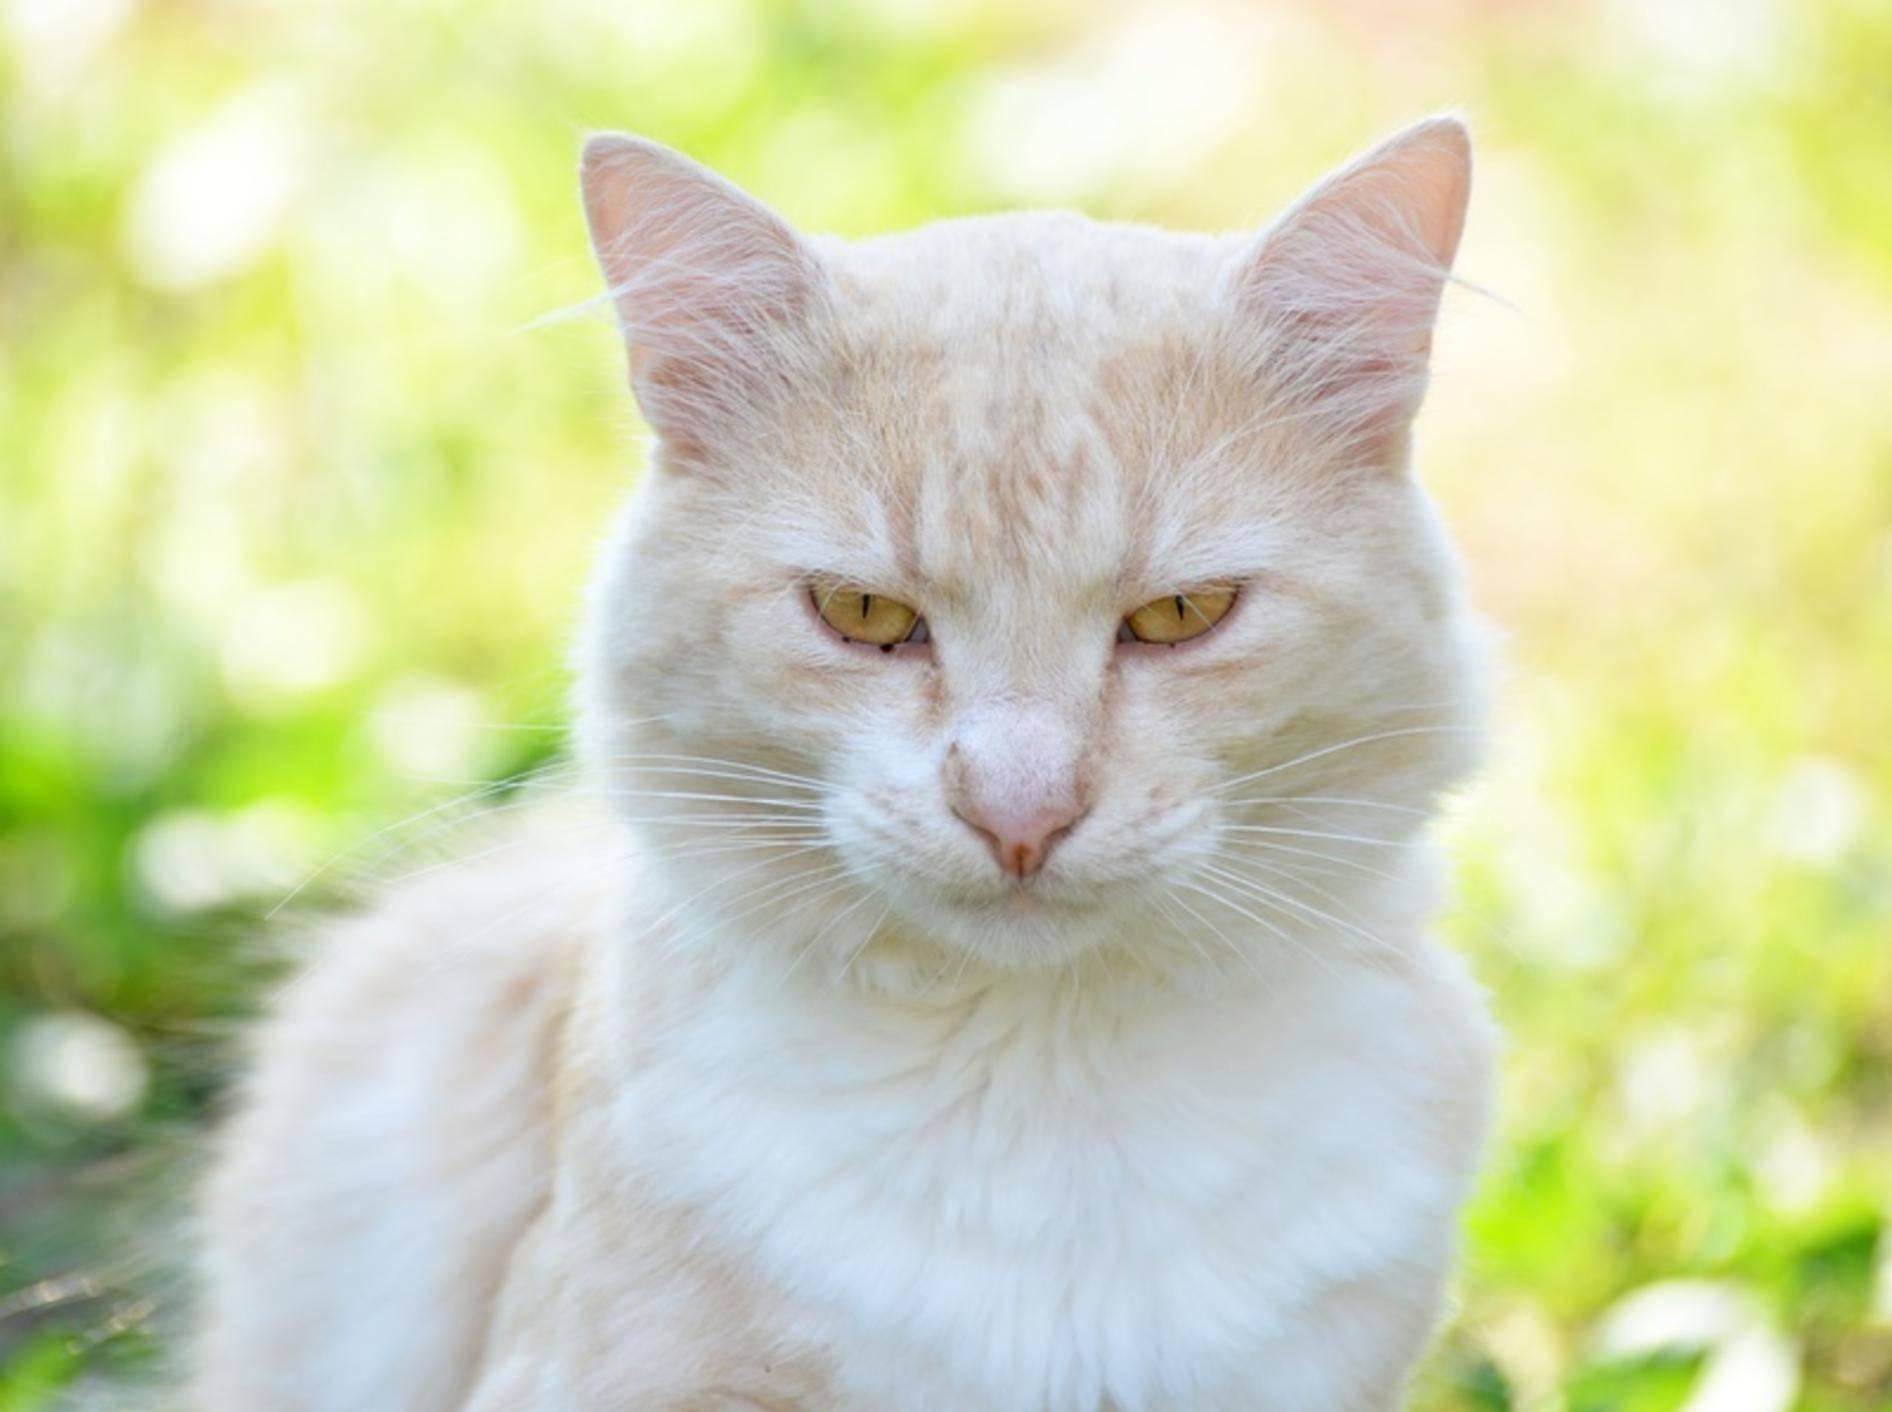 gelbe-Katze-schaut-grimmig